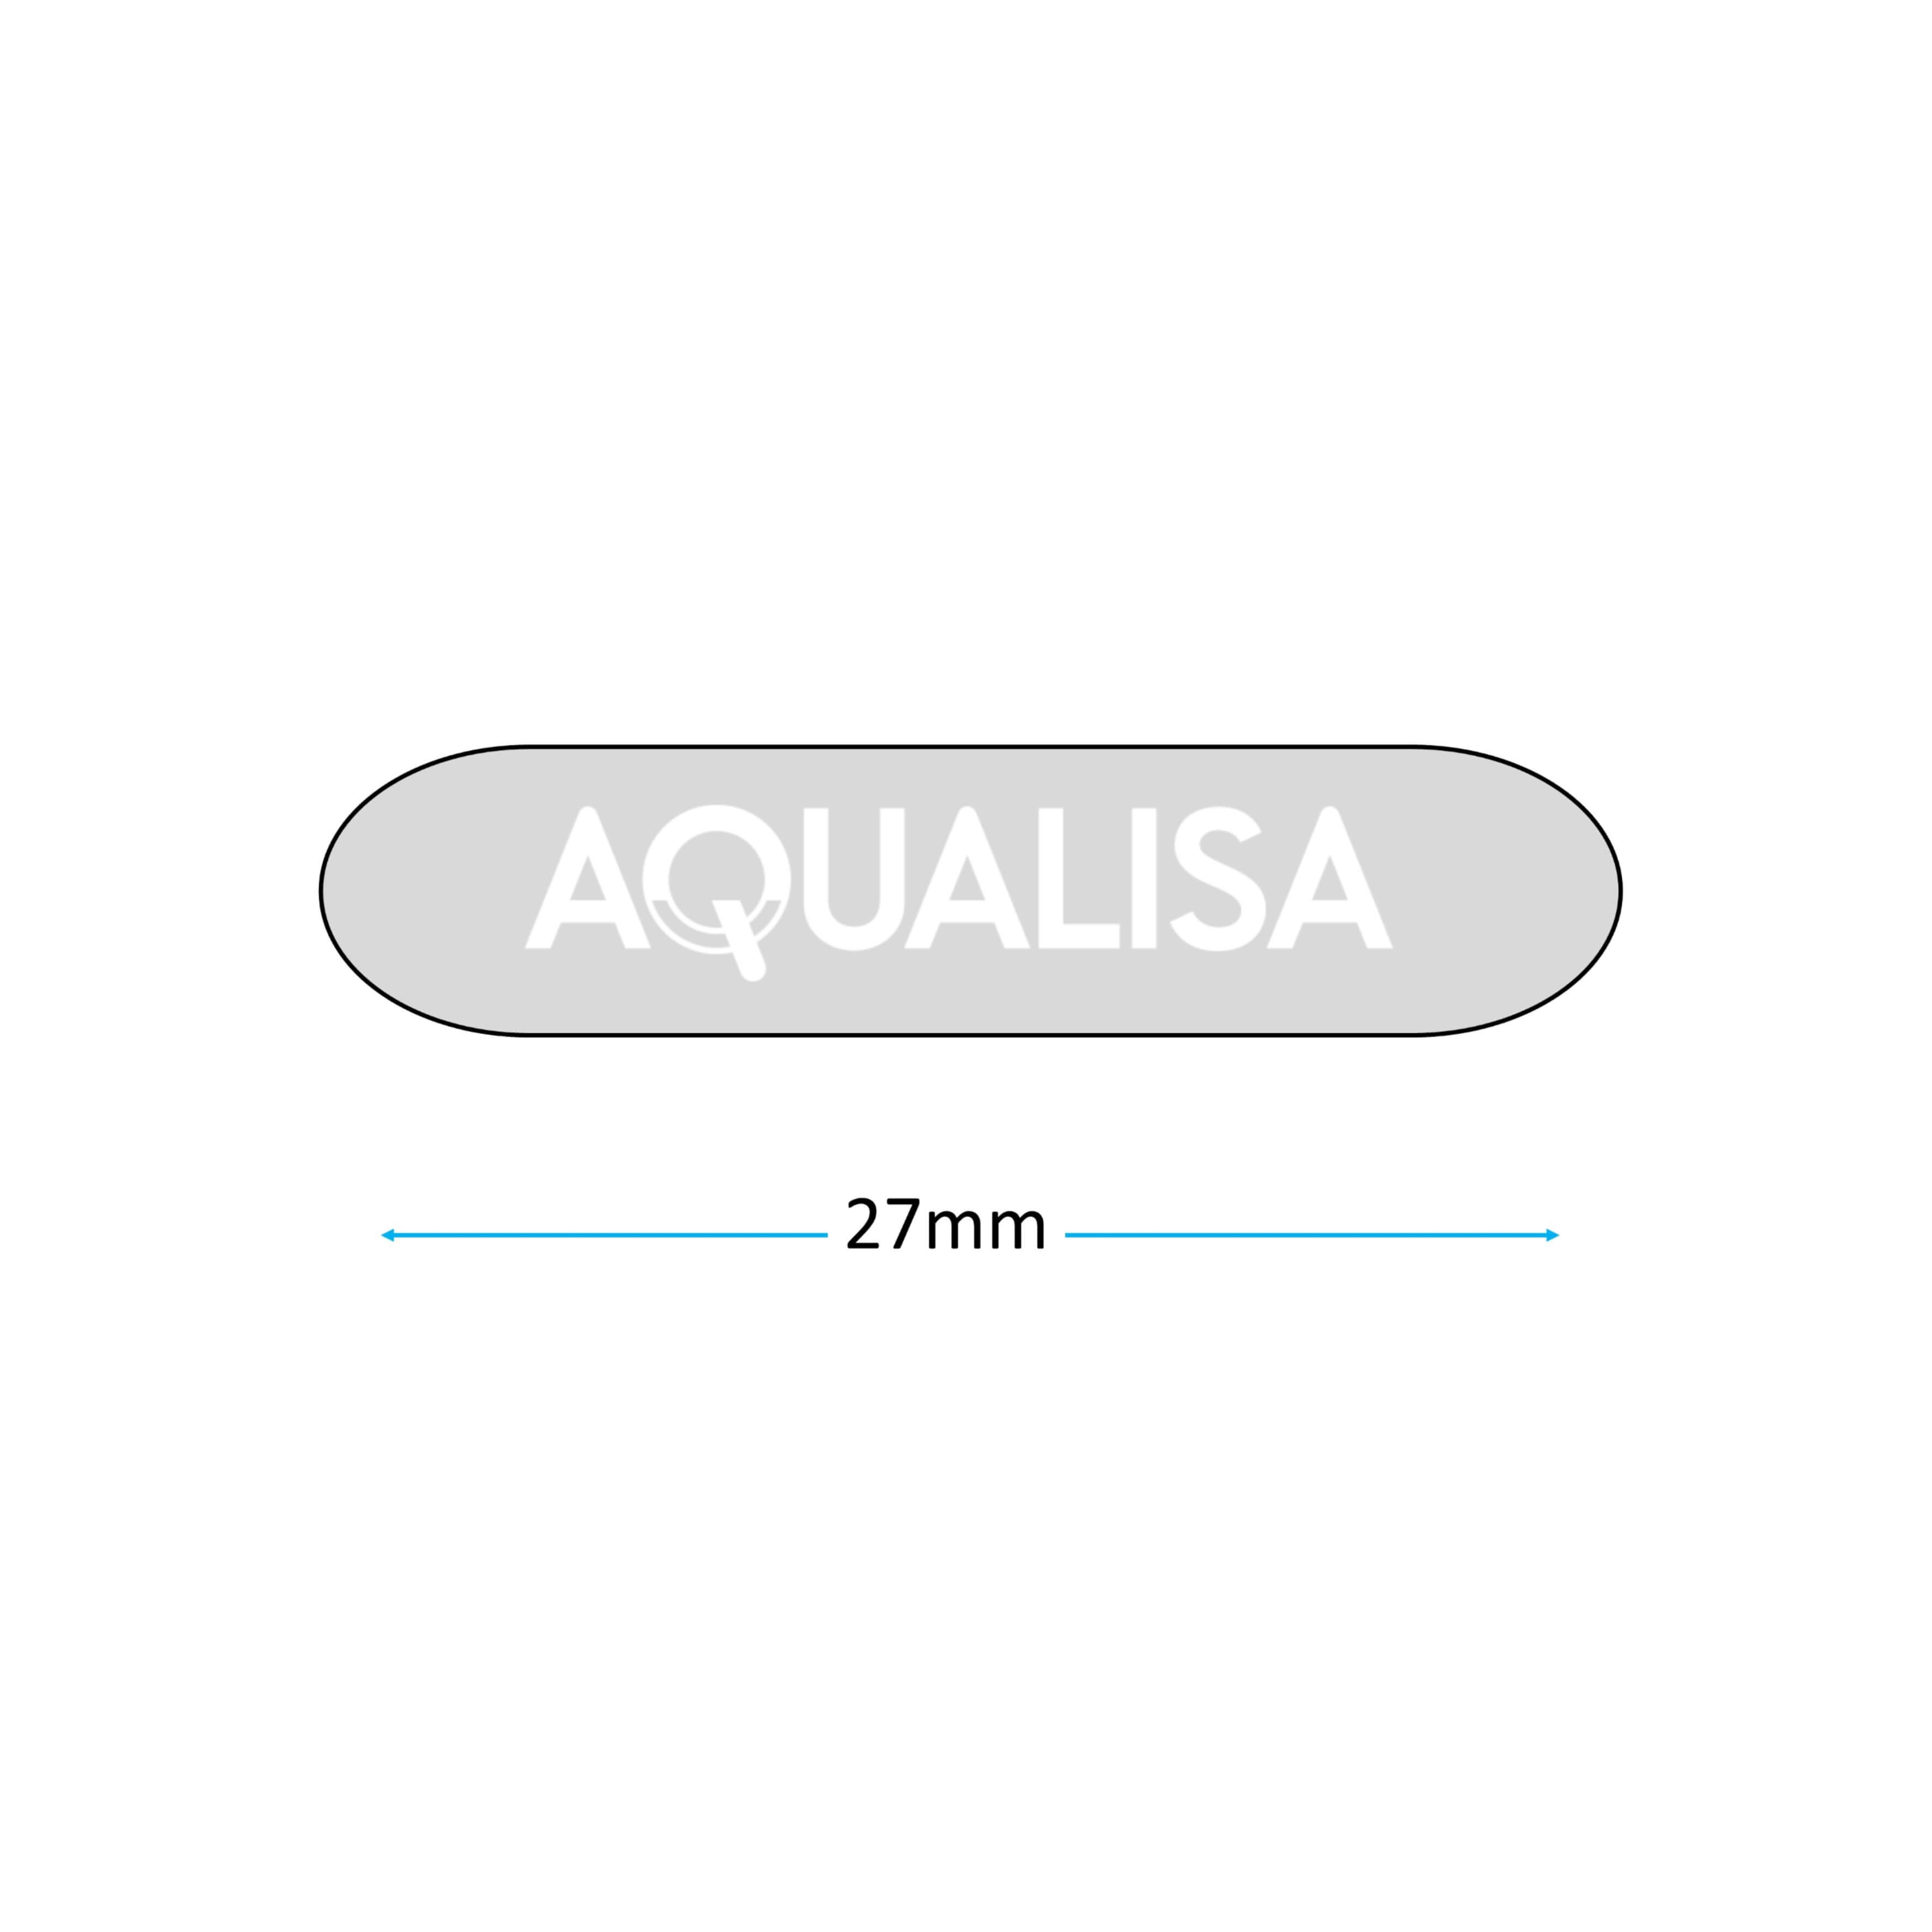 Aqualisa Badge 213037 Measurements